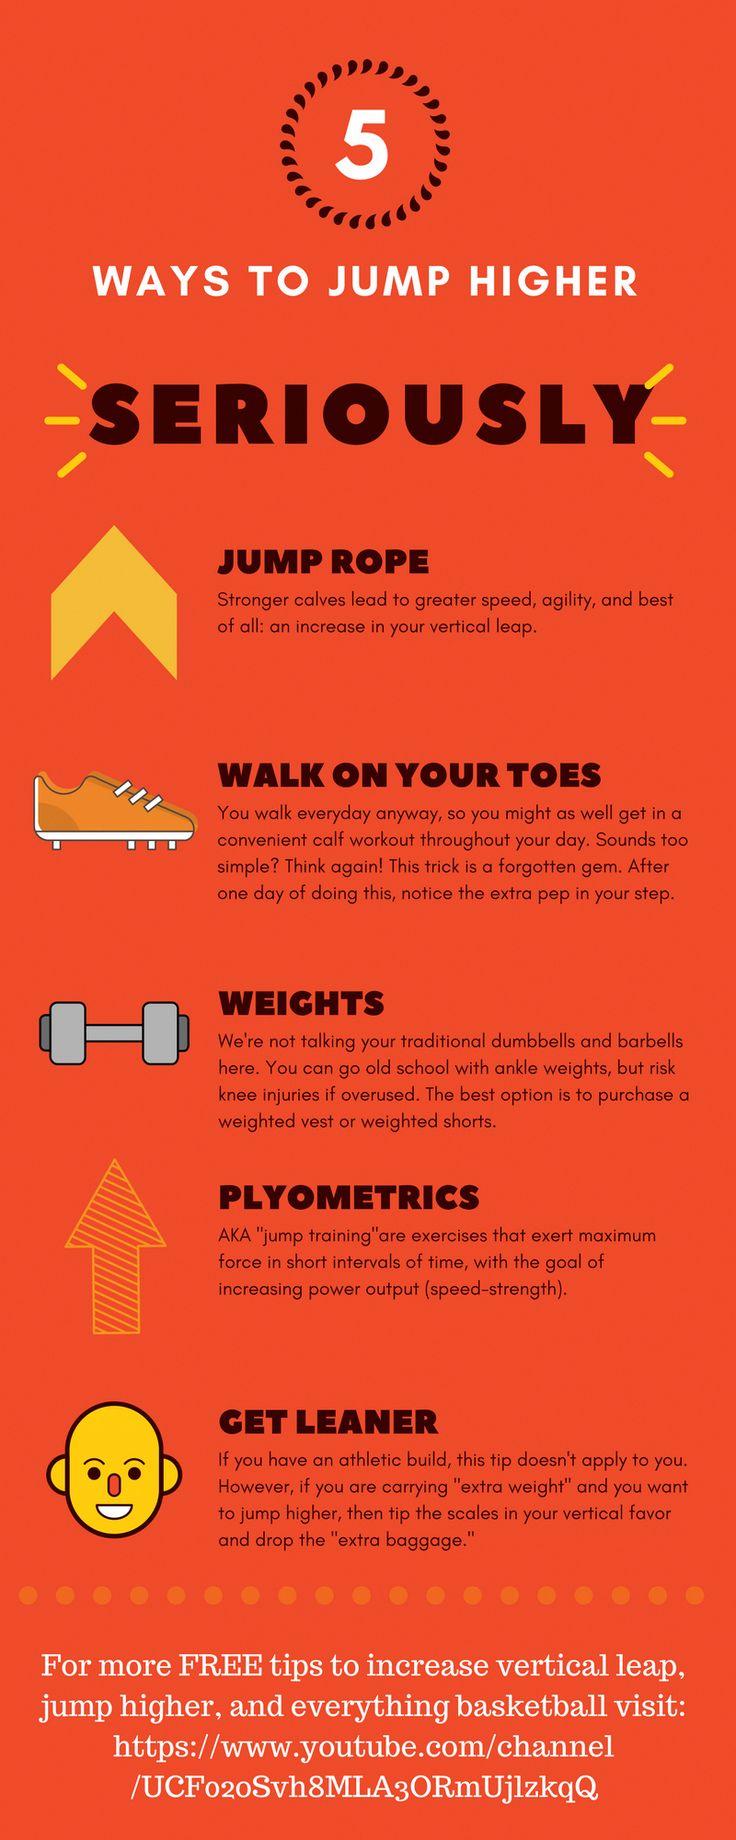 Basketball Knee Injury Info